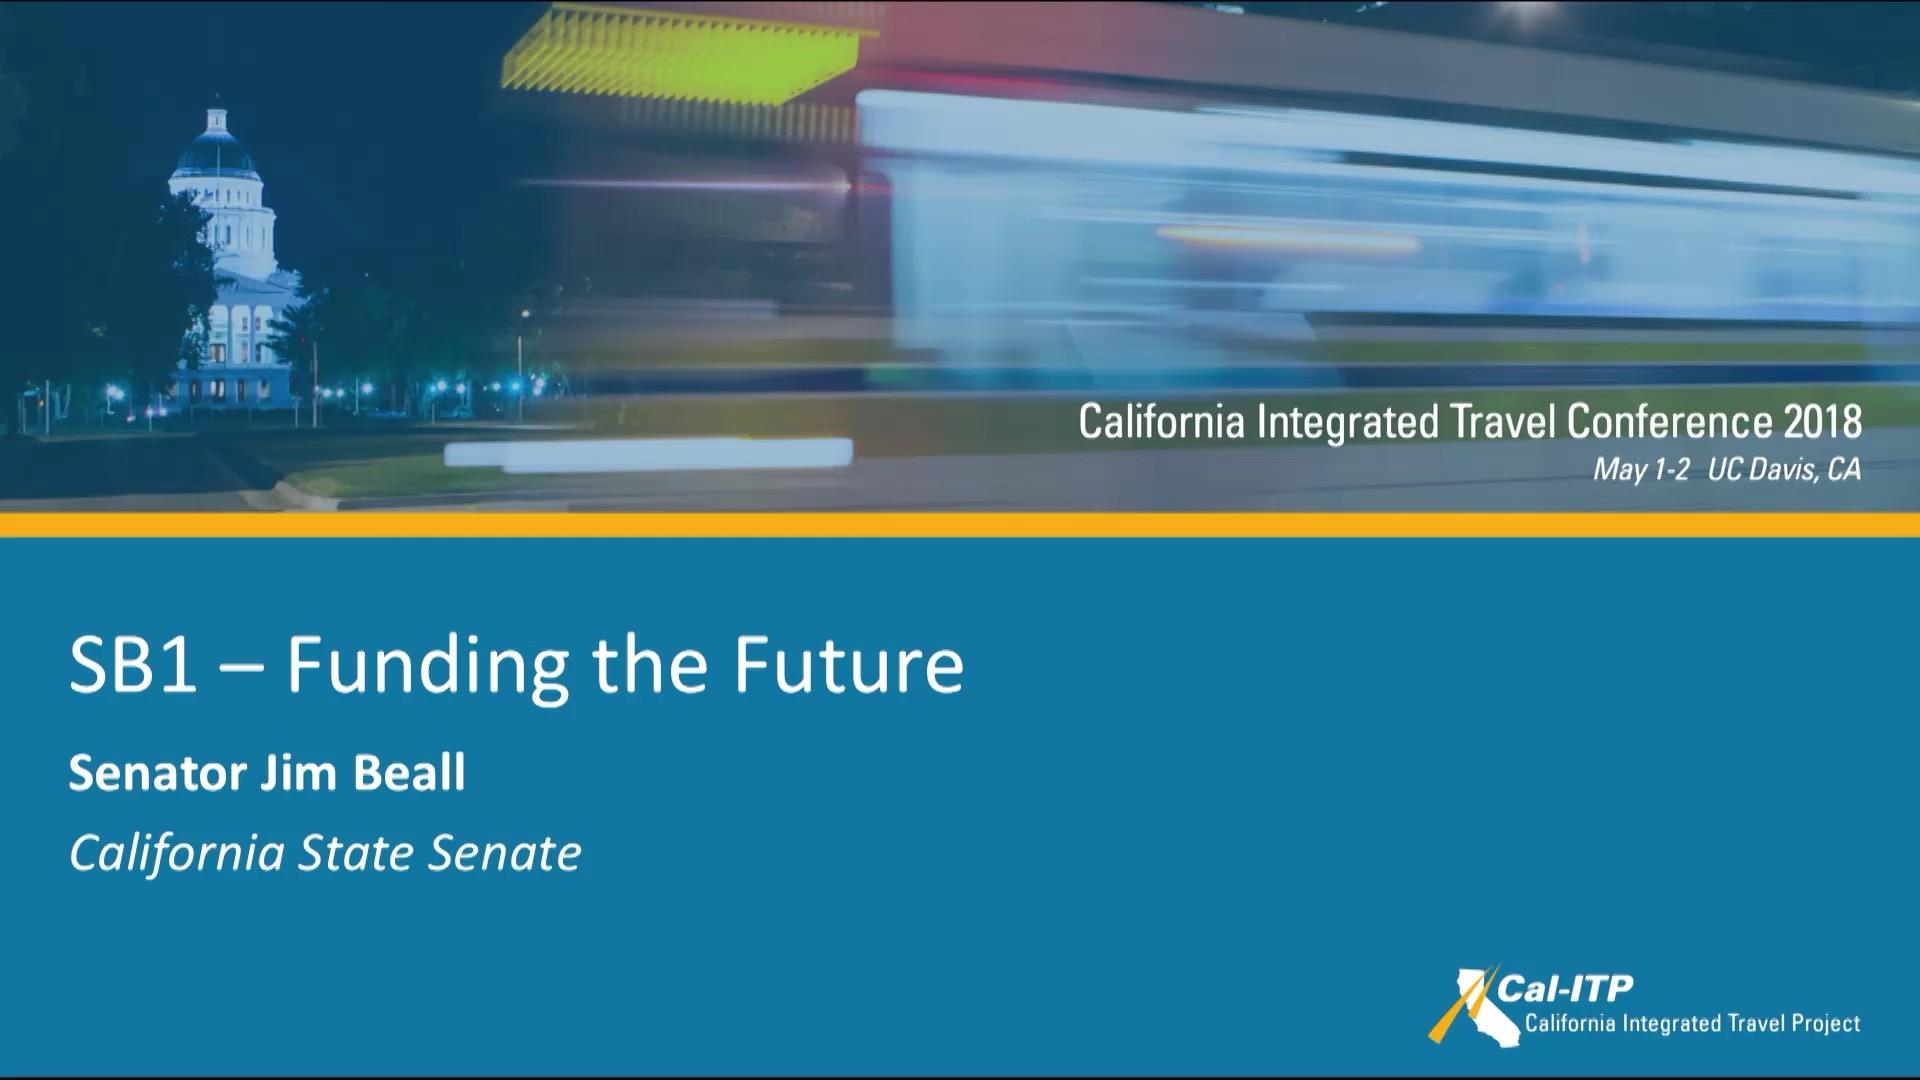 15. SB1 - Funding the Future